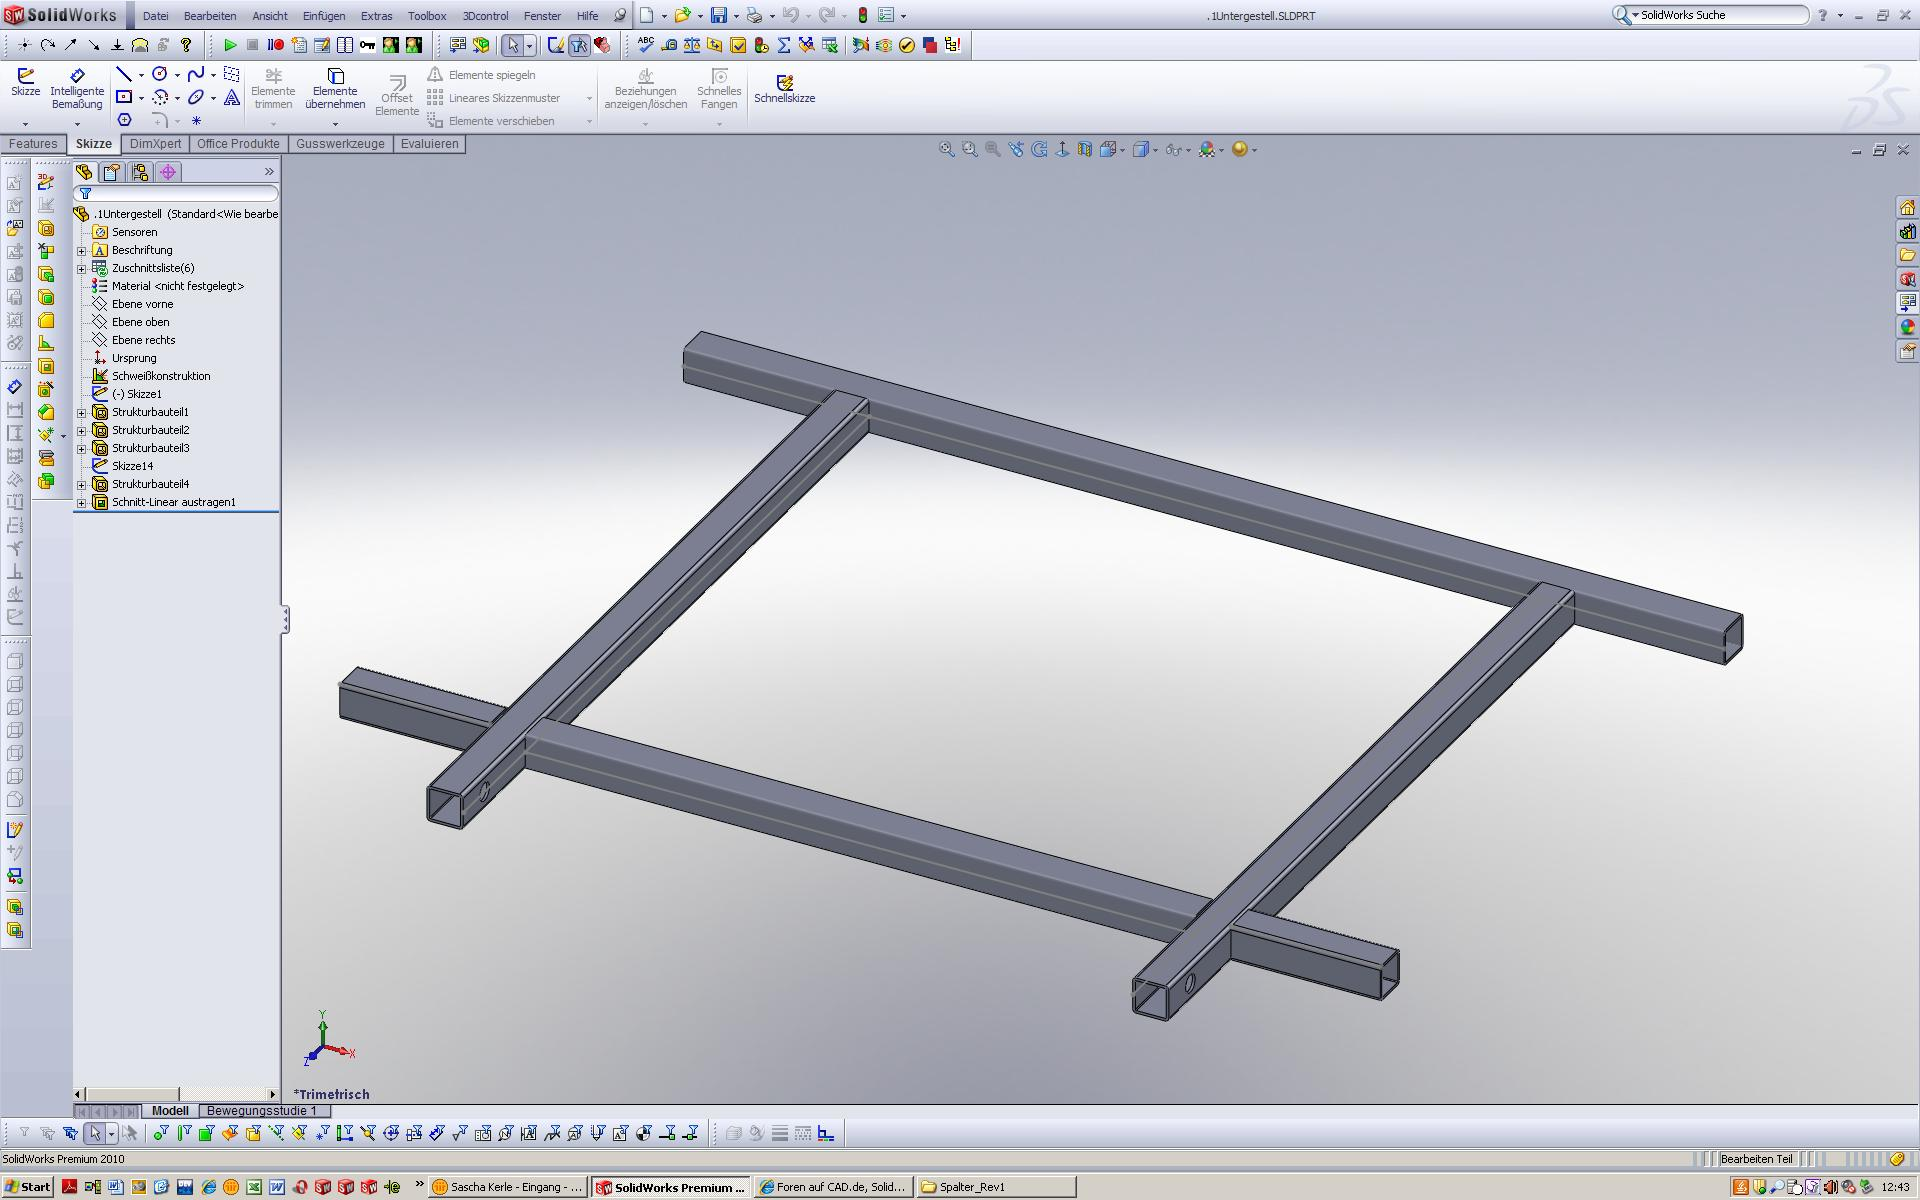 Fantastisch Solidworks Rahmen Design Fotos - Bilderrahmen Ideen ...